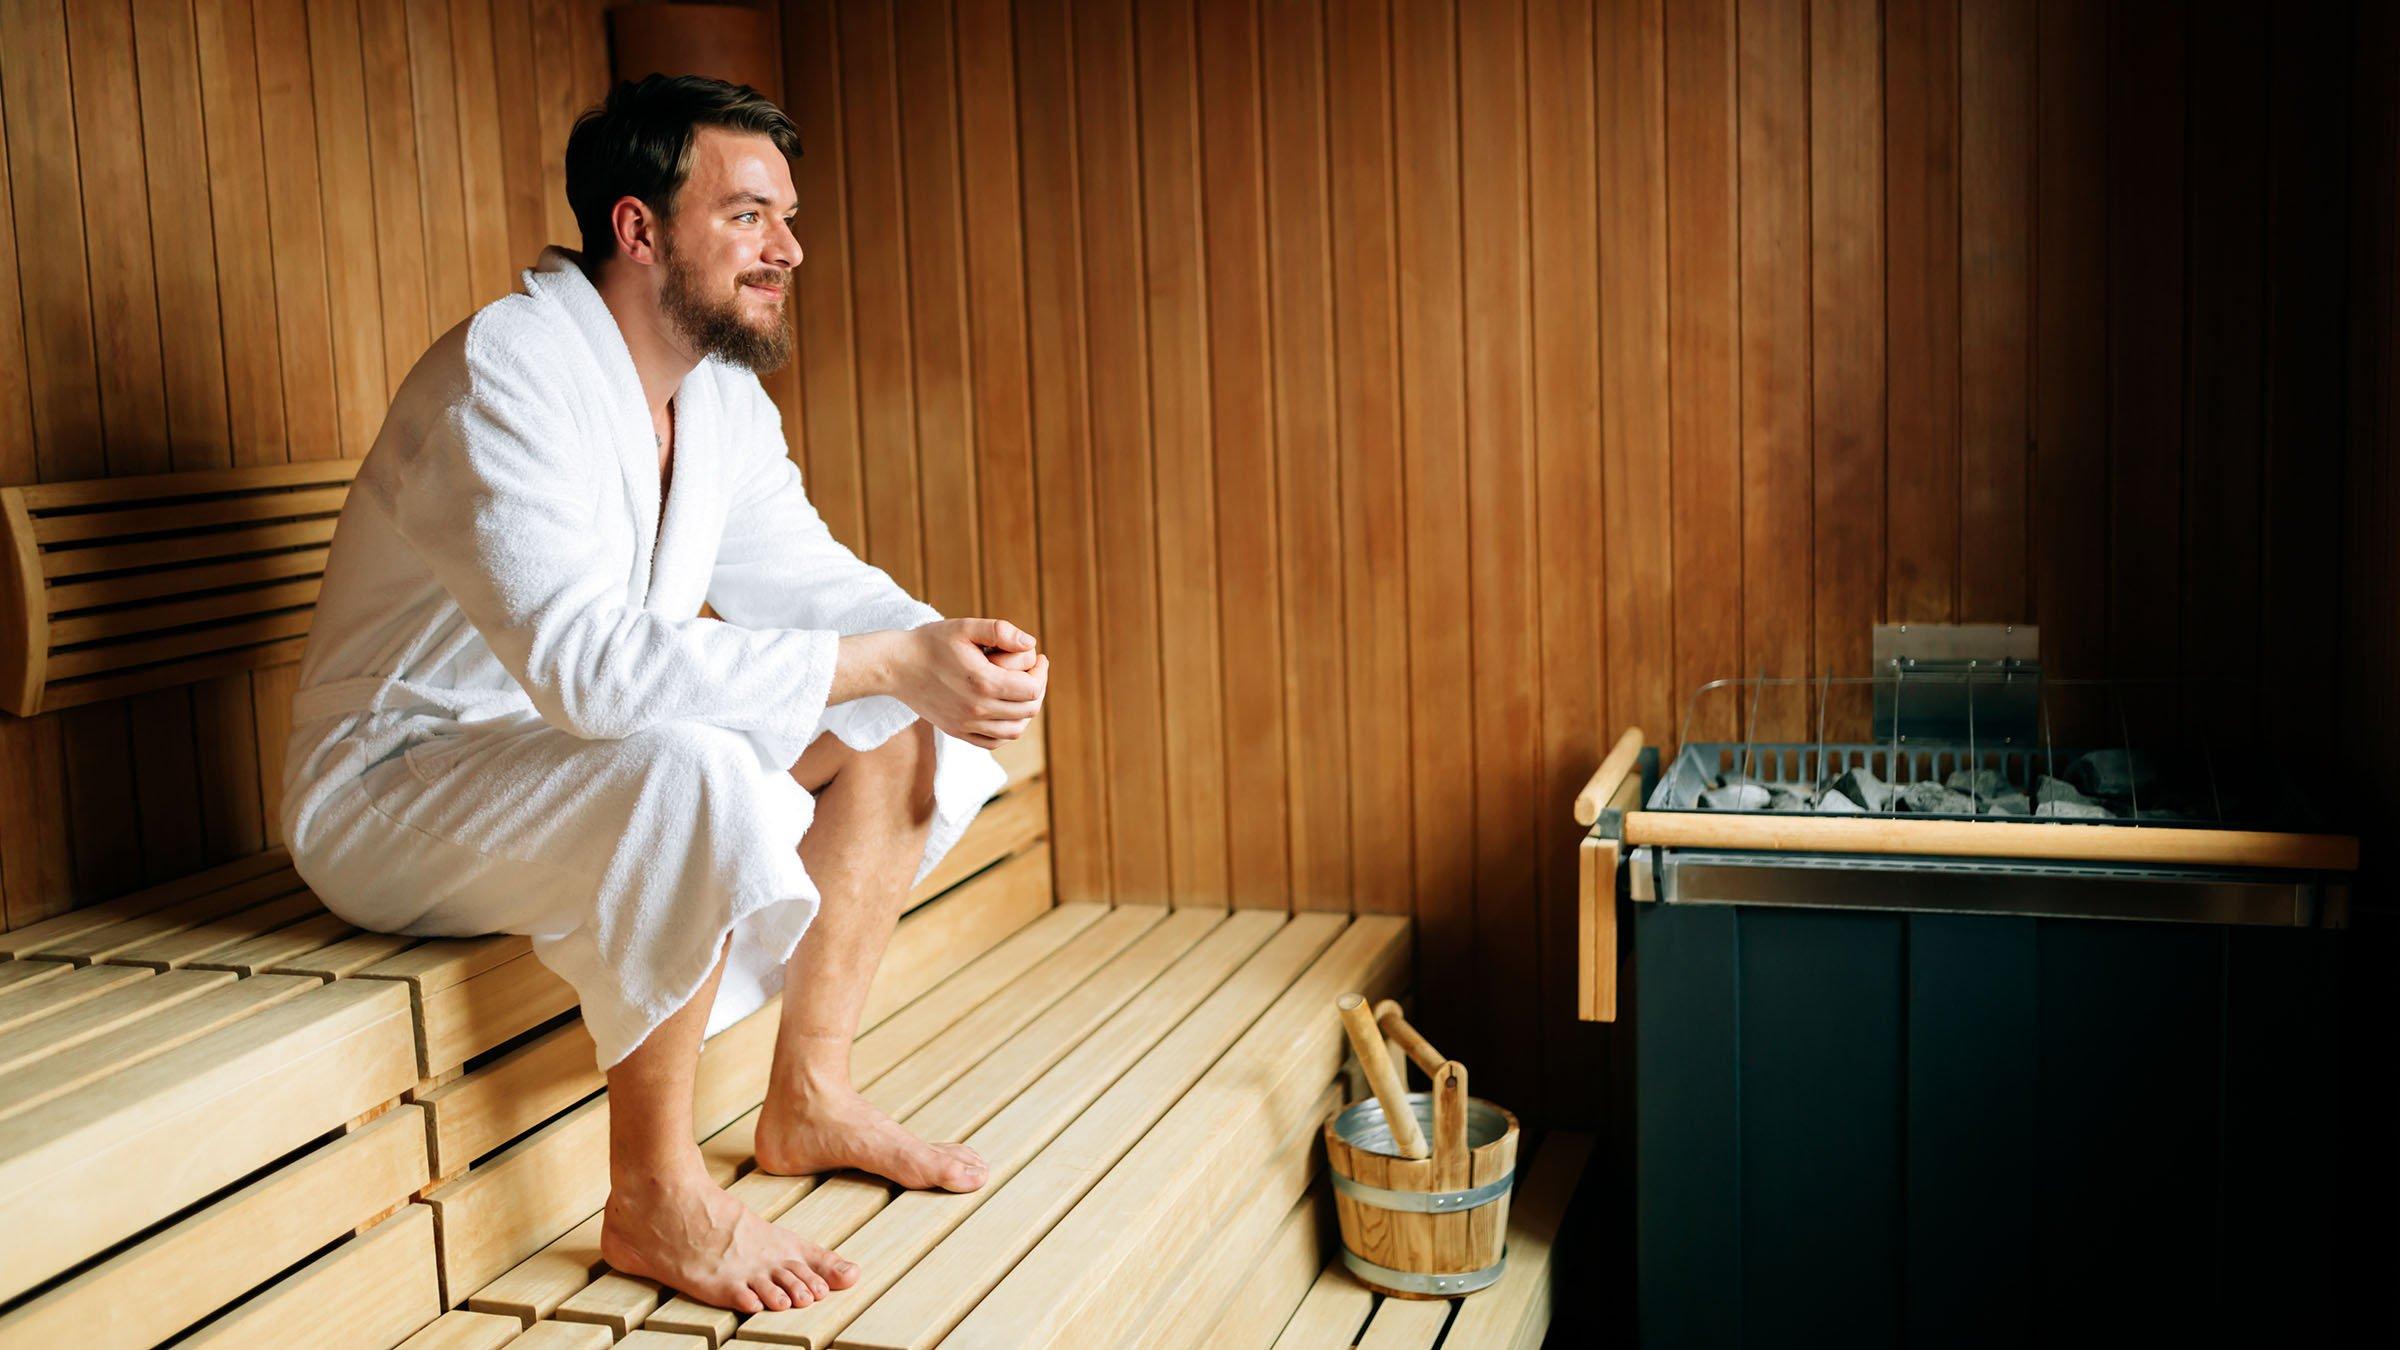 Sauna en Finlandia